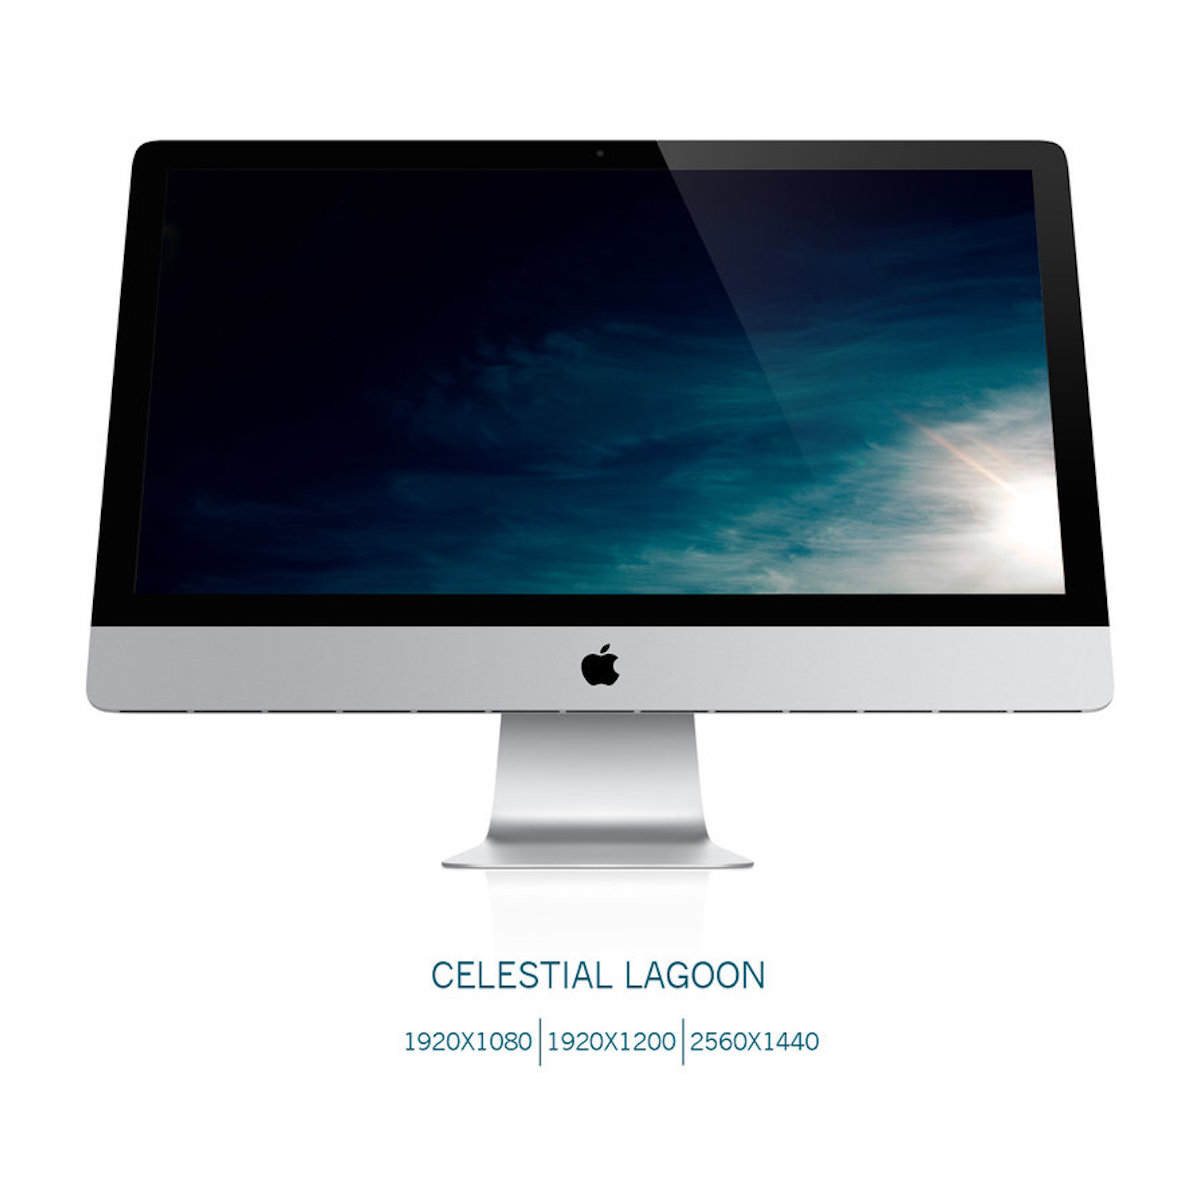 Celestial Lagoon